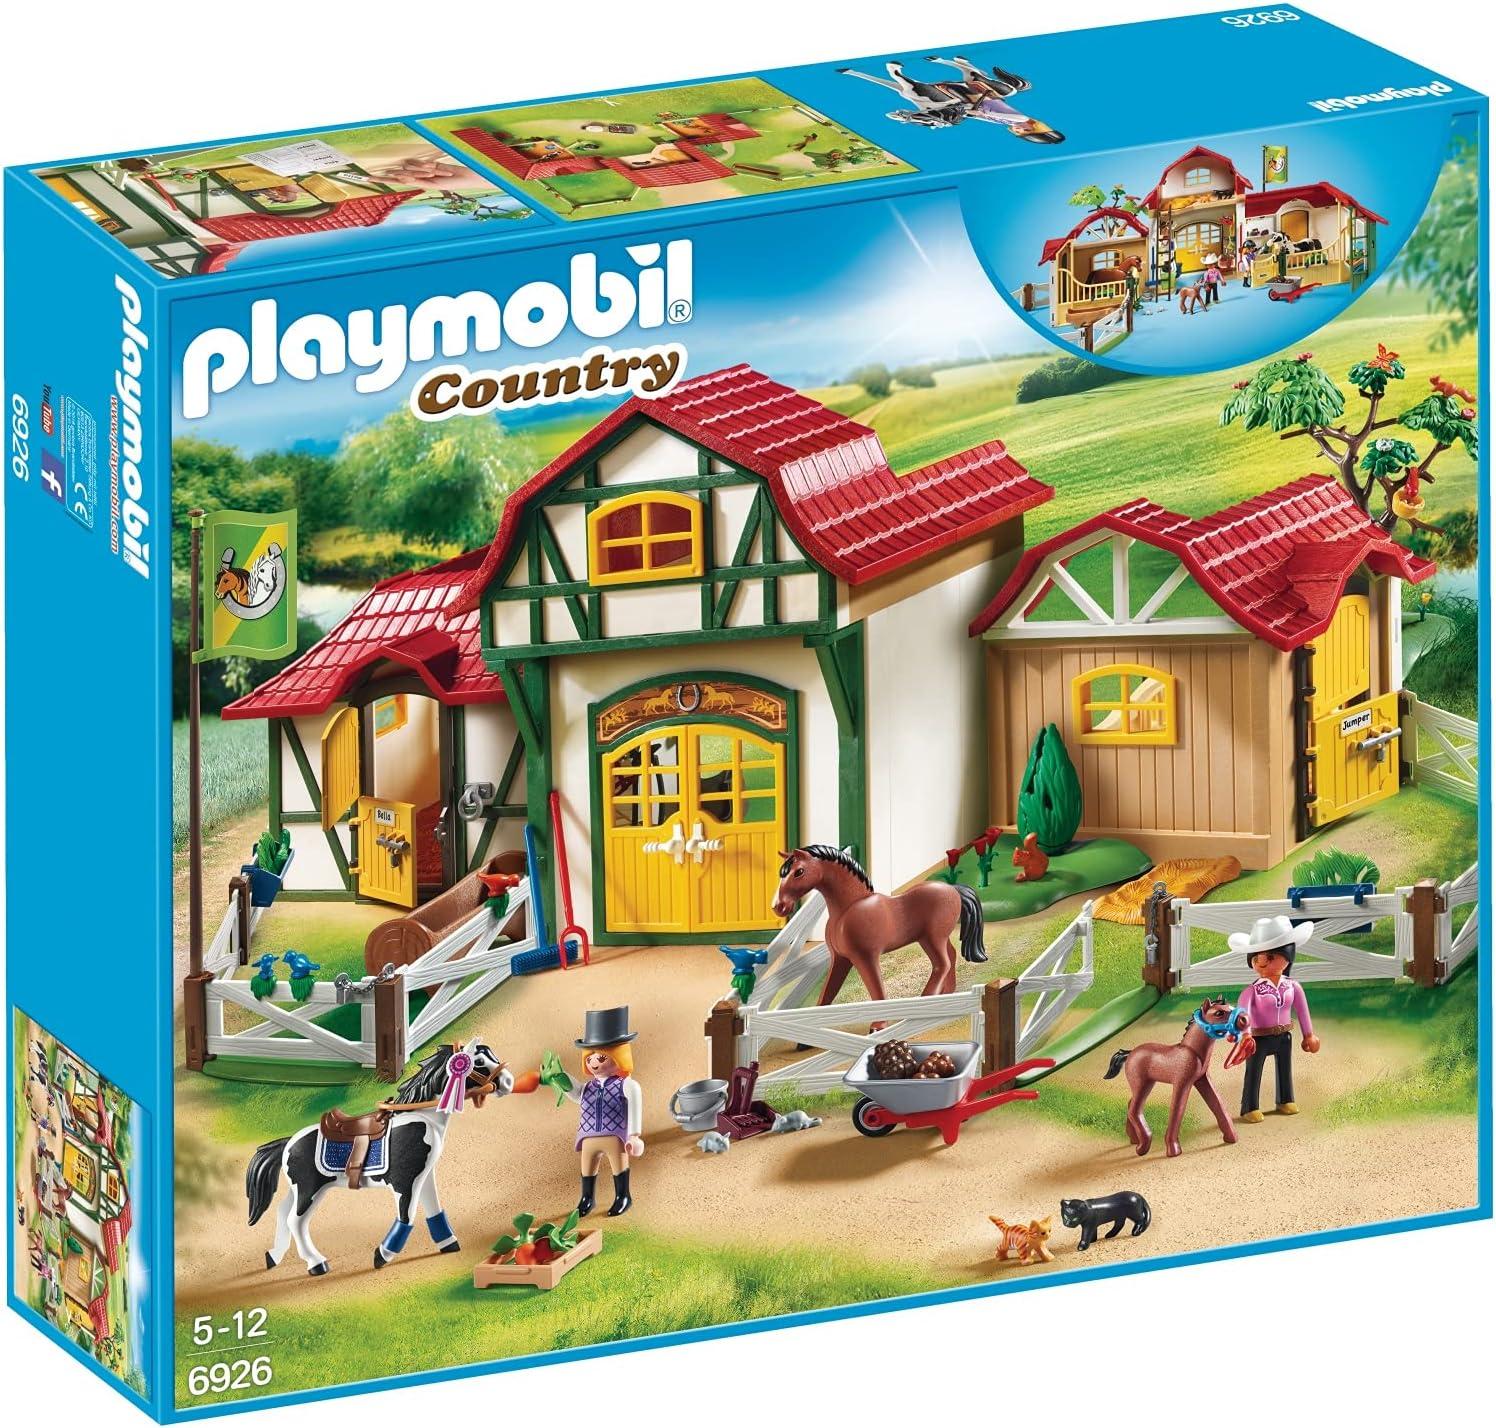 PLAYMOBIL Horse Farm Free Shipping Cheap Bargain Gift Set trust Building